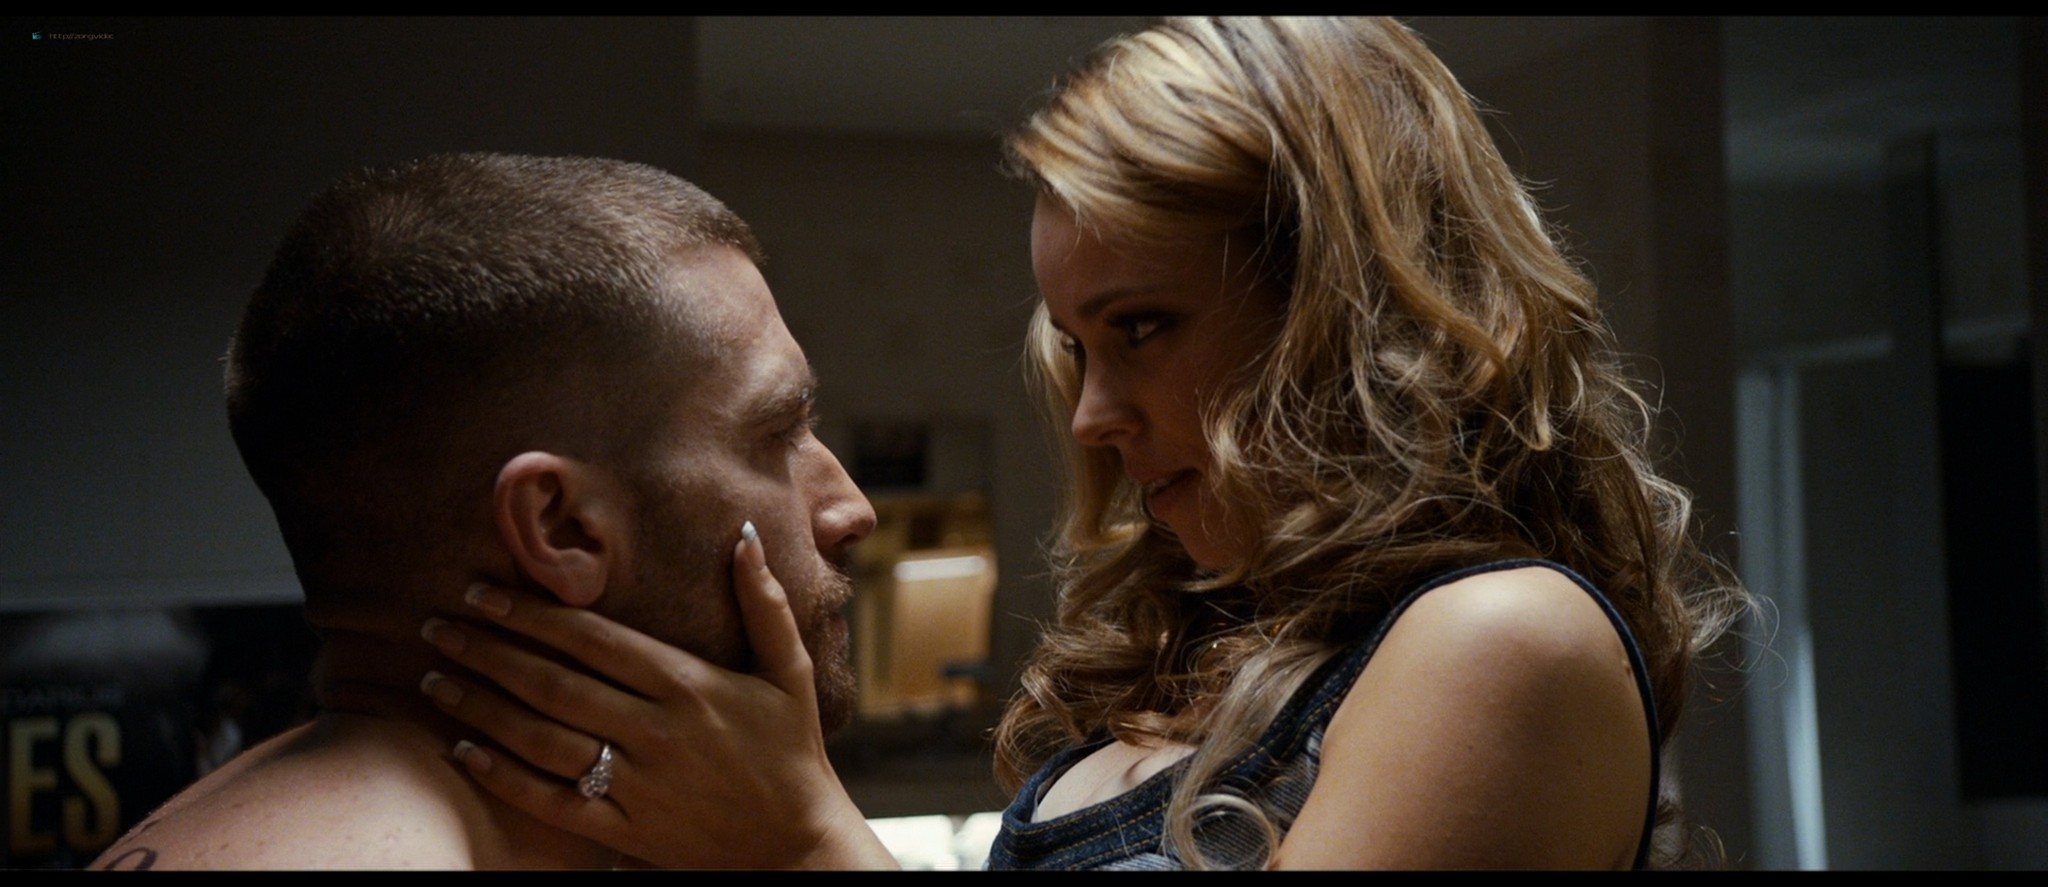 Rachel McAdams hot in panties and bra - Southpaw (2015) HD 1080p BluRay (12)